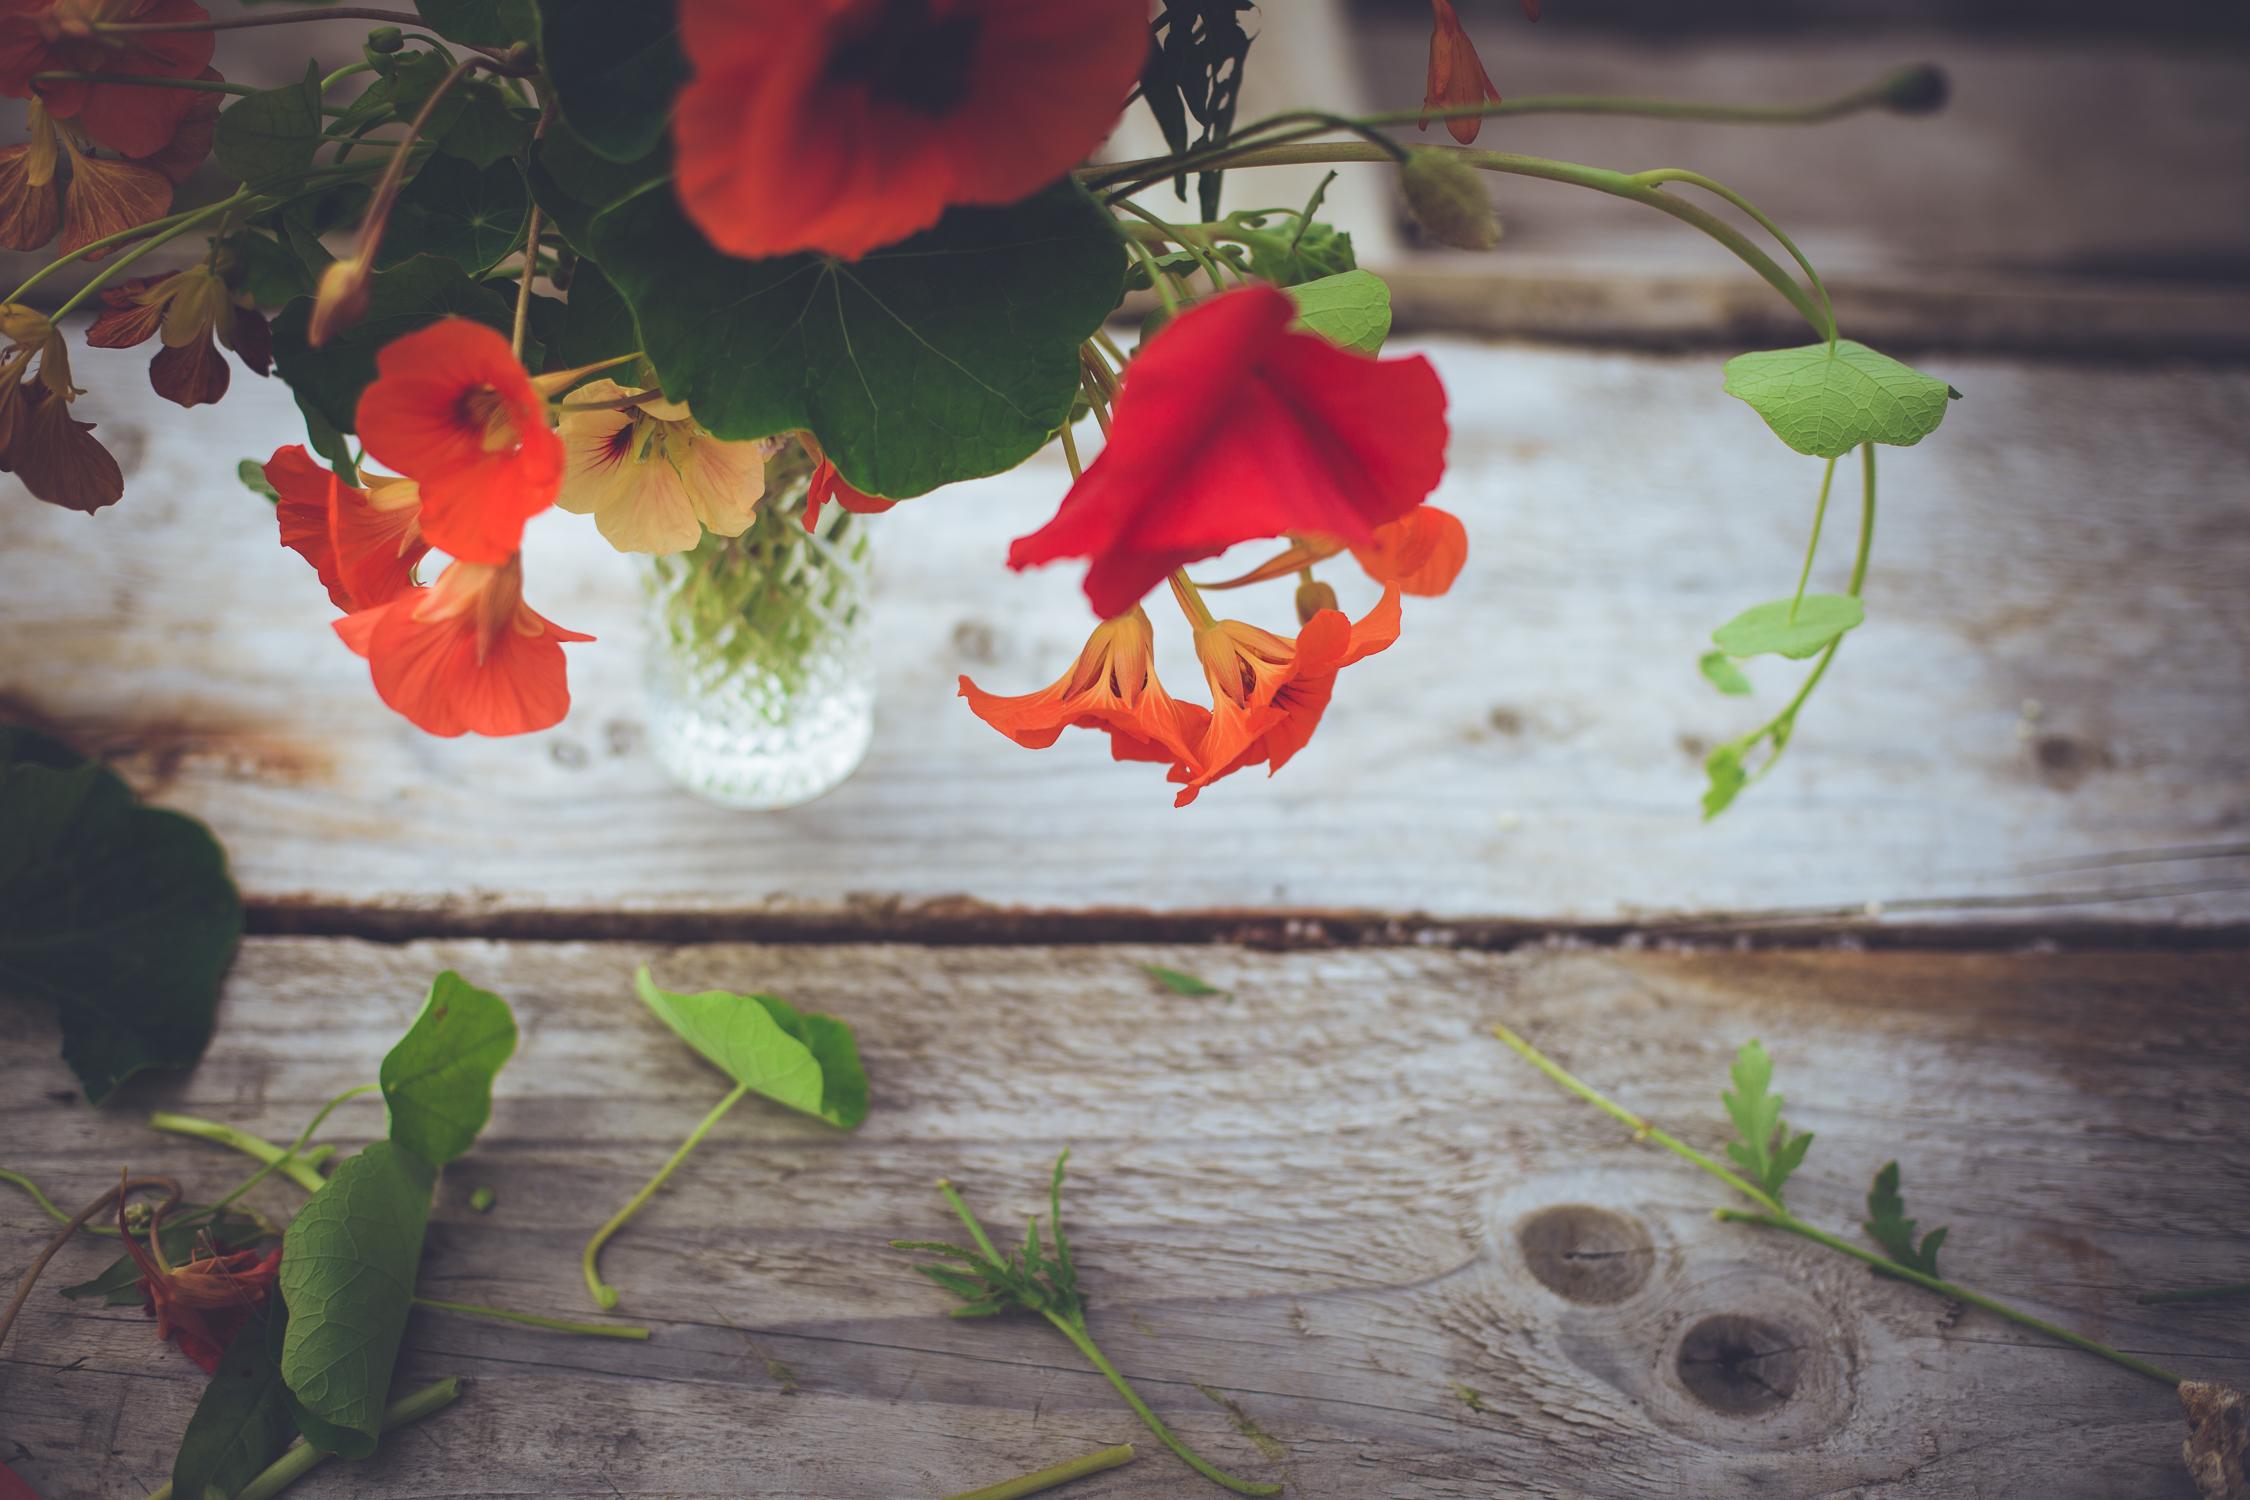 donegal petal-4.jpg